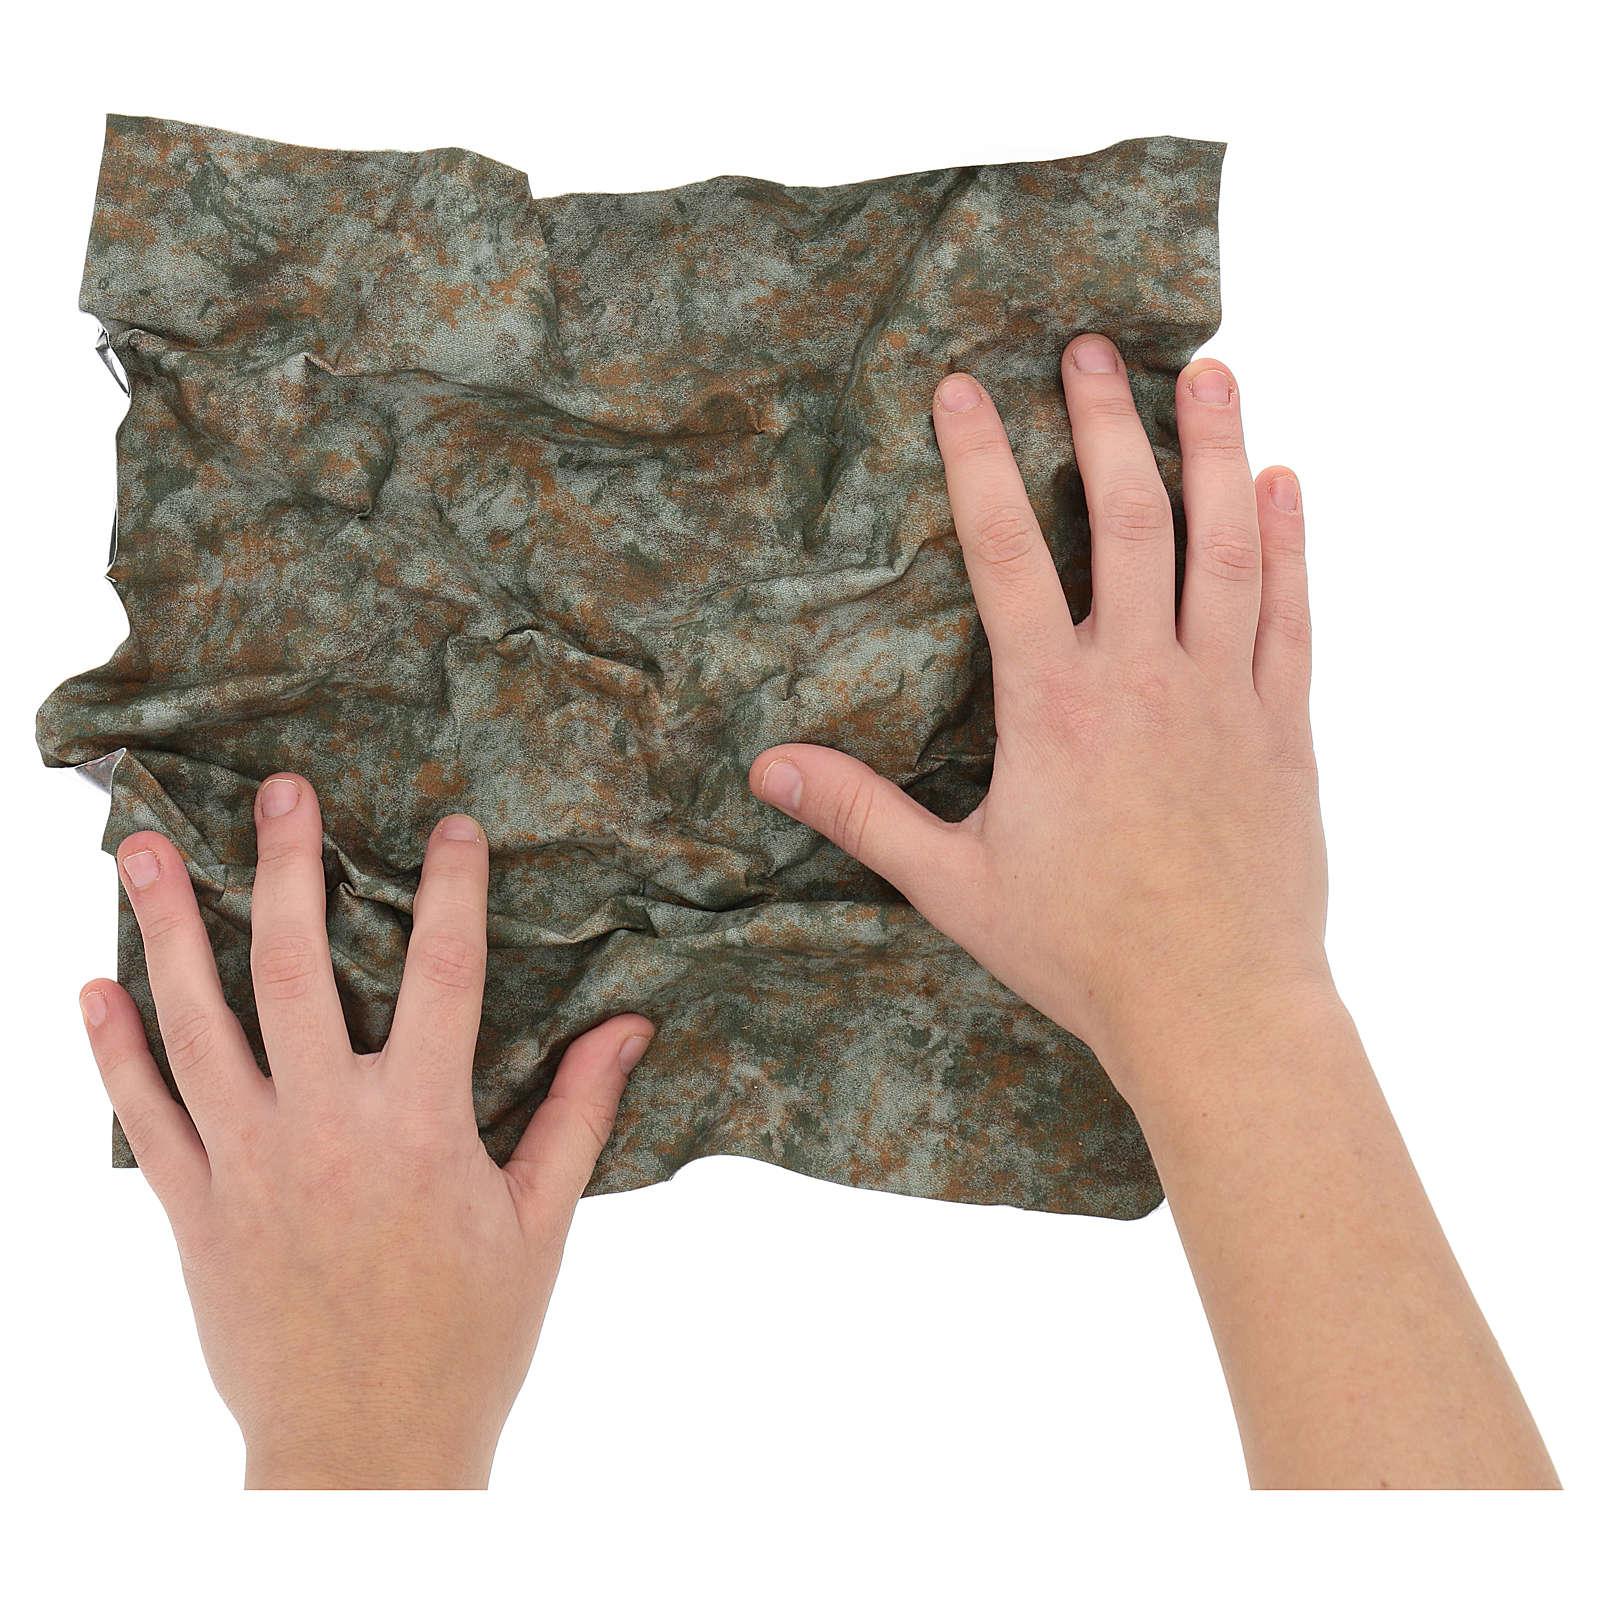 Carta tronco d'albero modellabile 30x30 cm per presepi 4